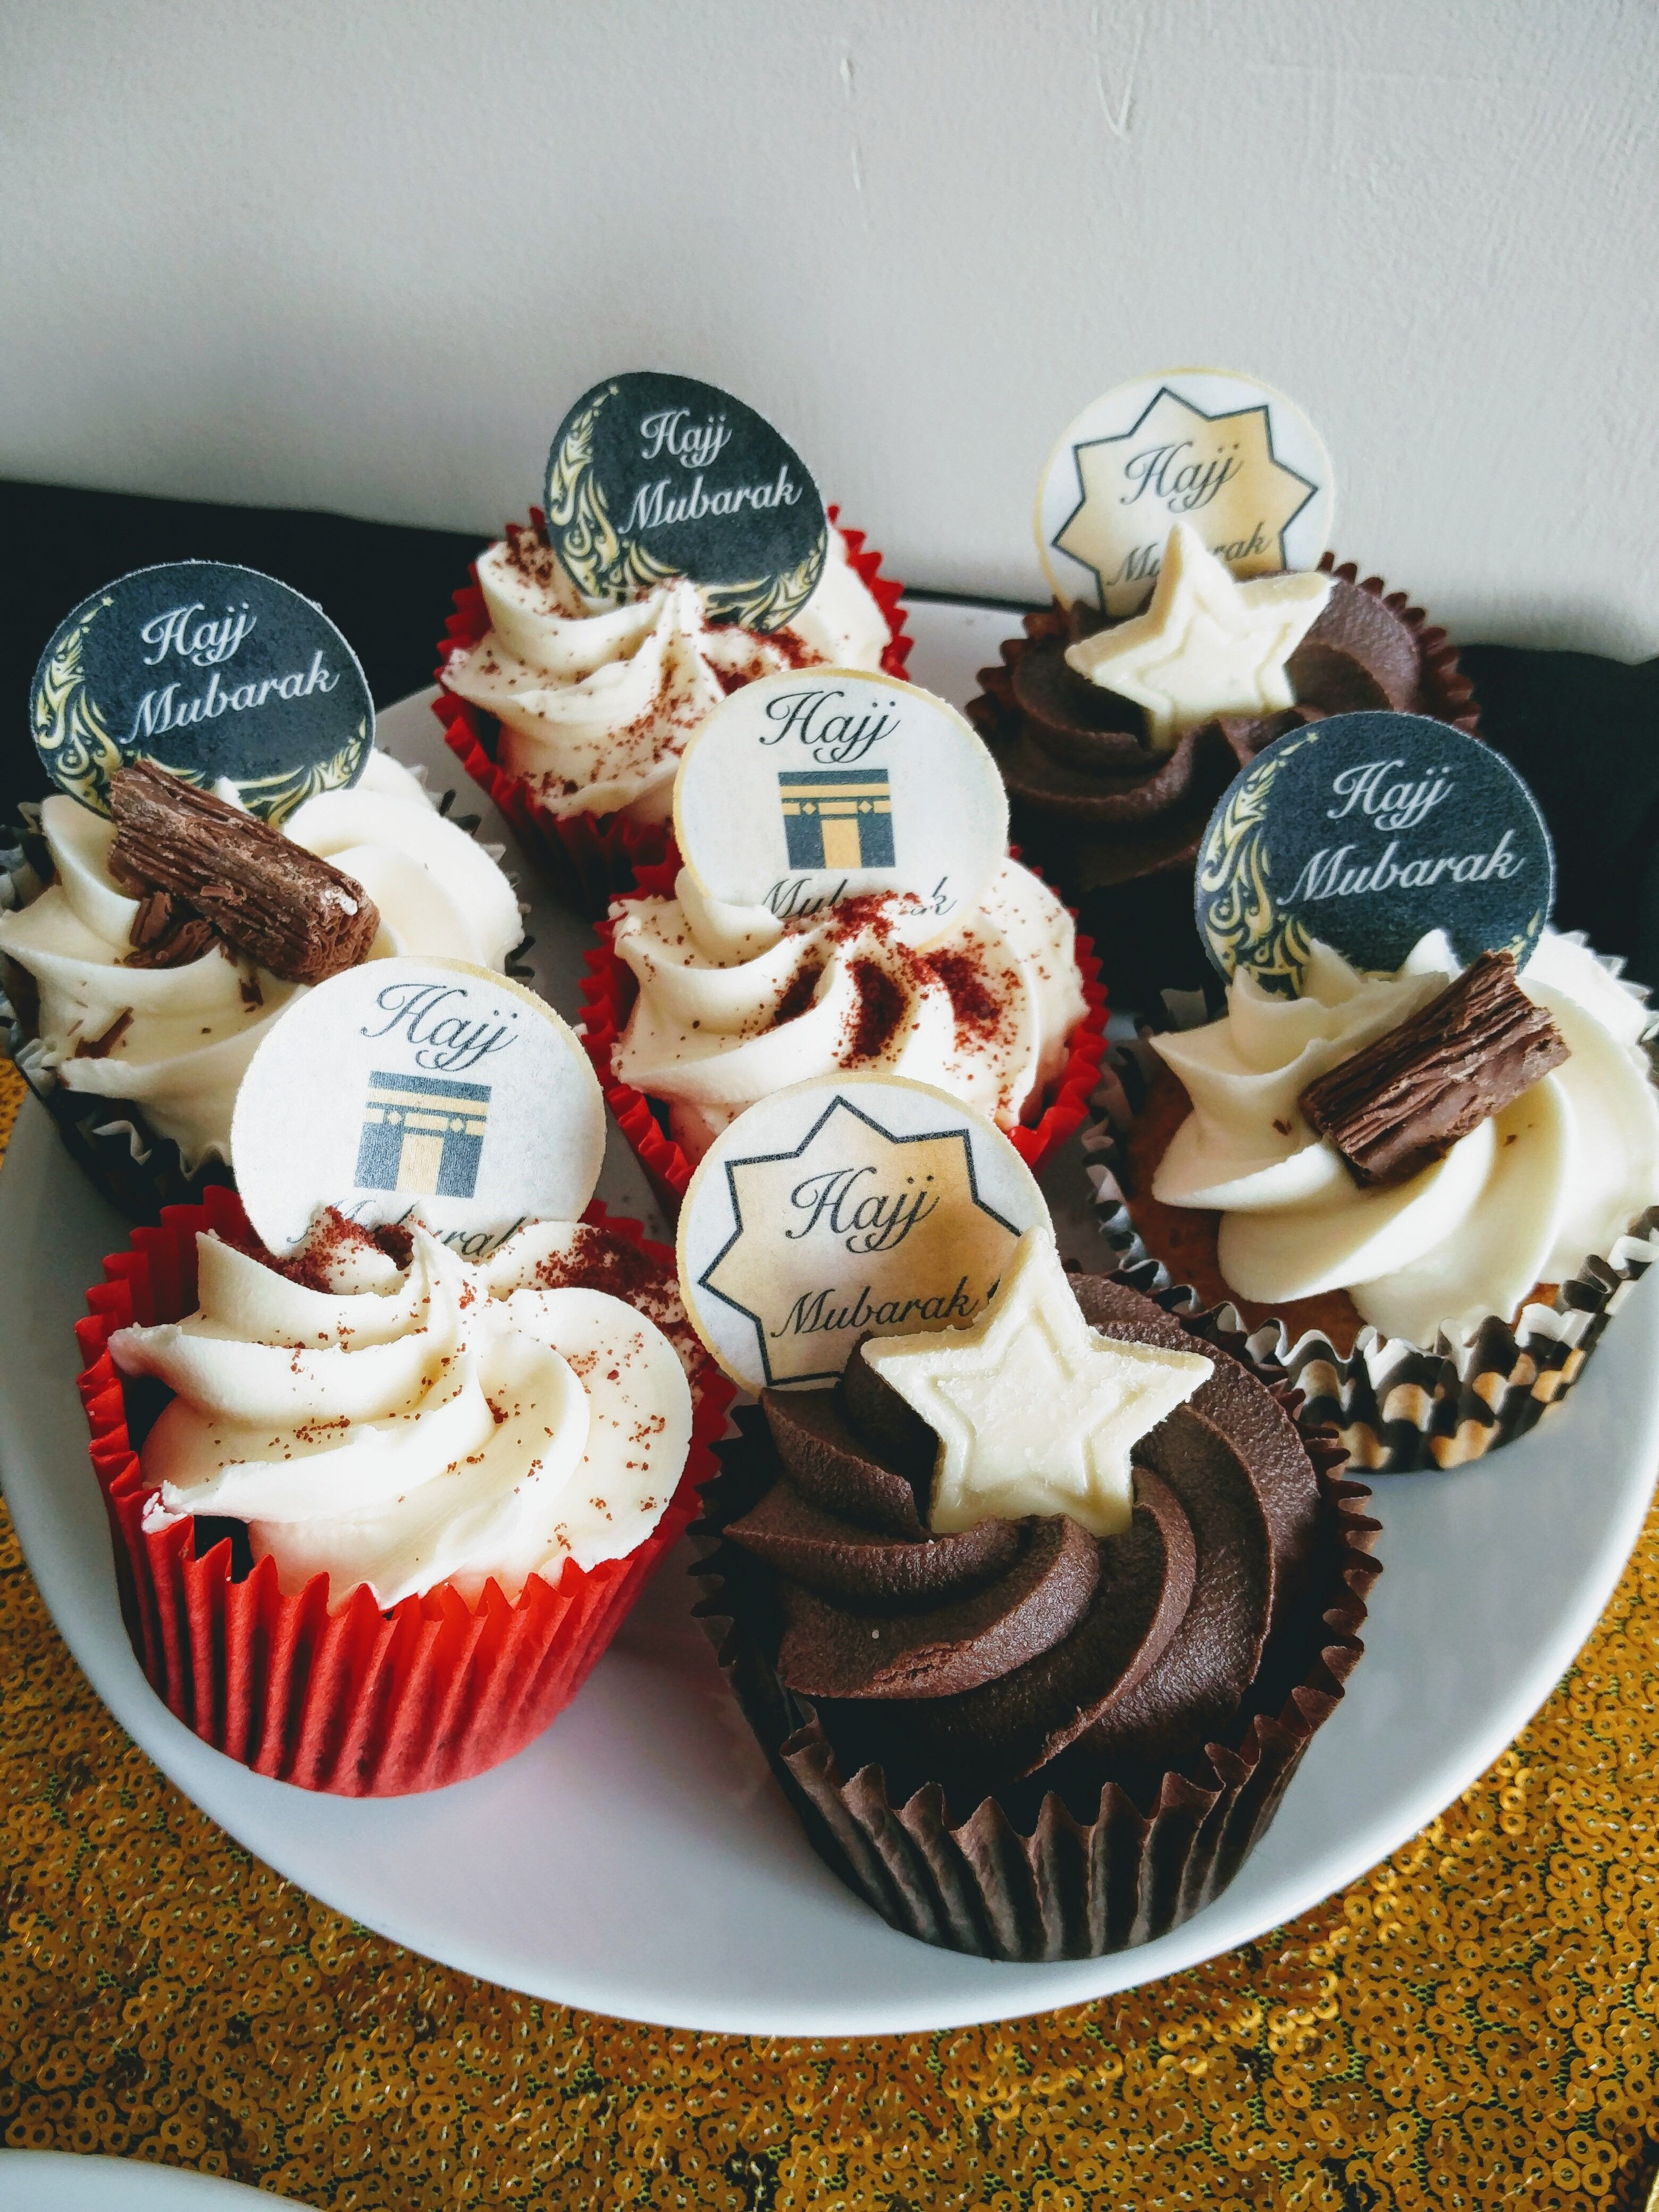 Home Furniture Diy Eid Mubarak Festival Muslim Edible Cupcake Toppers Wafer Or Icing X 12 Kisetsu System Co Jp